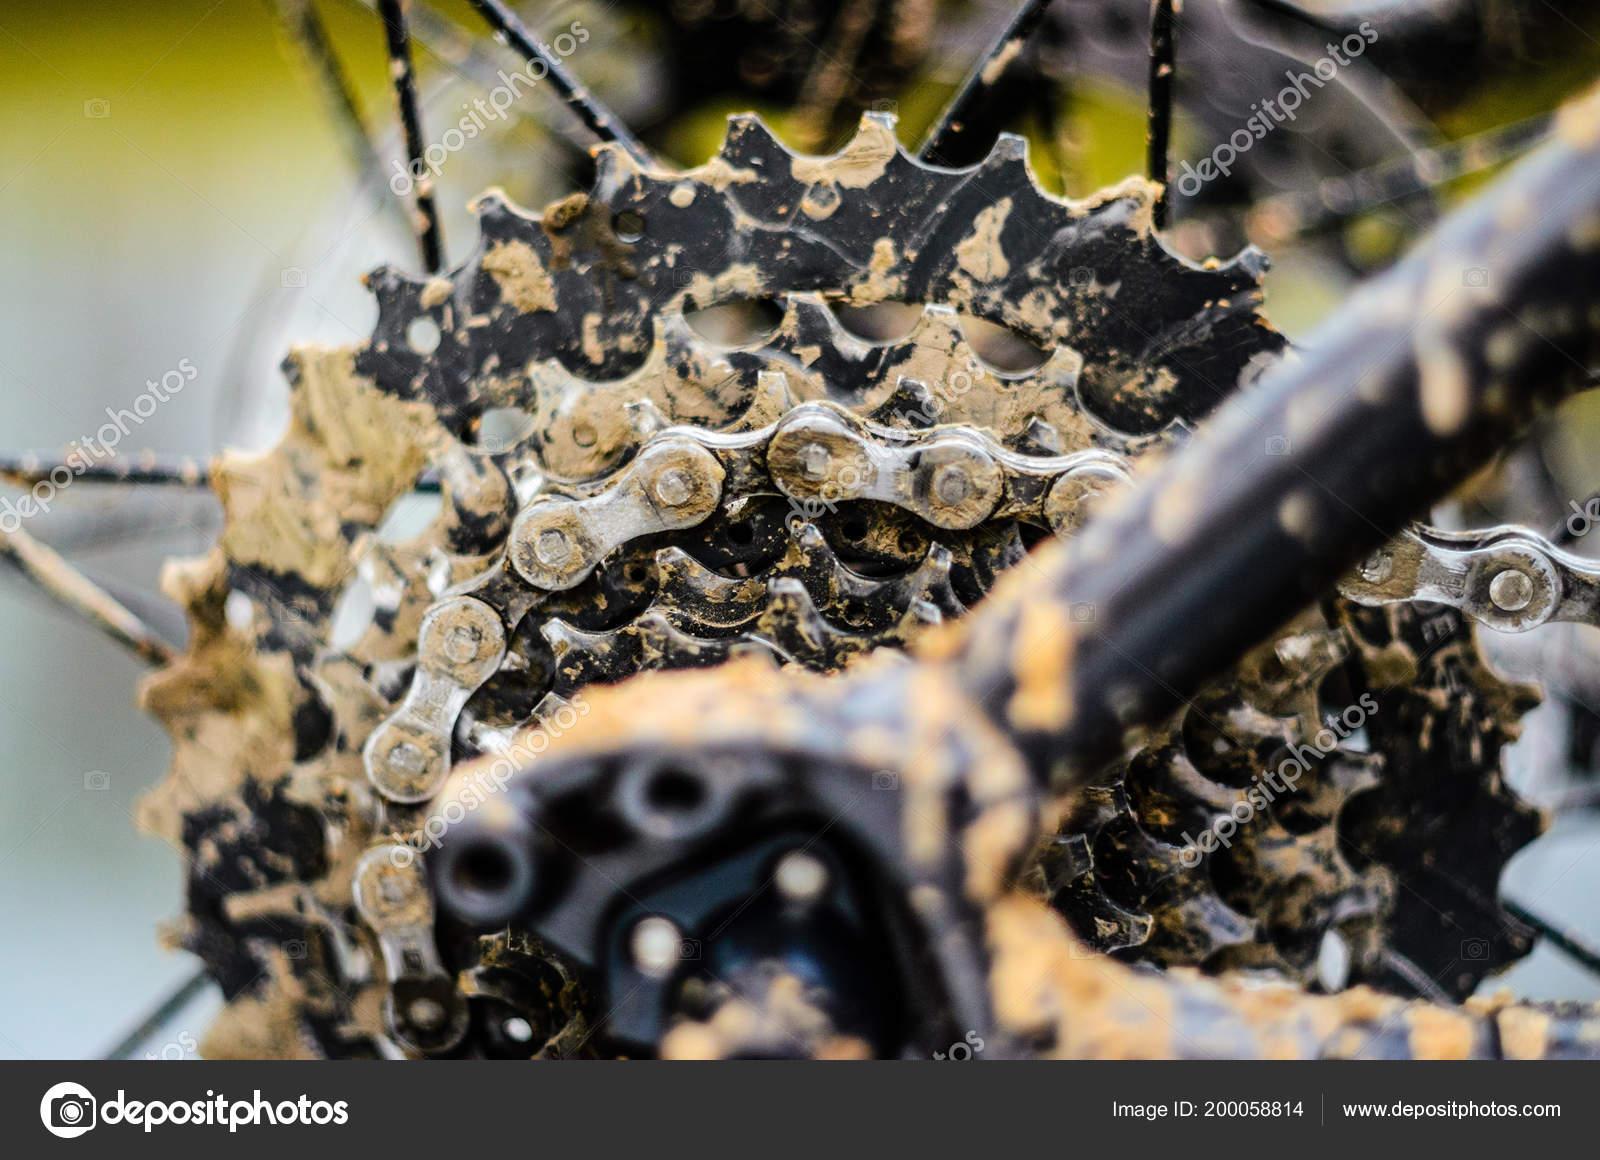 Mountain Bike Transmission Mud Dirty Chain Drive Mountain Bike Riding Stock Photo C V Sot 200058814